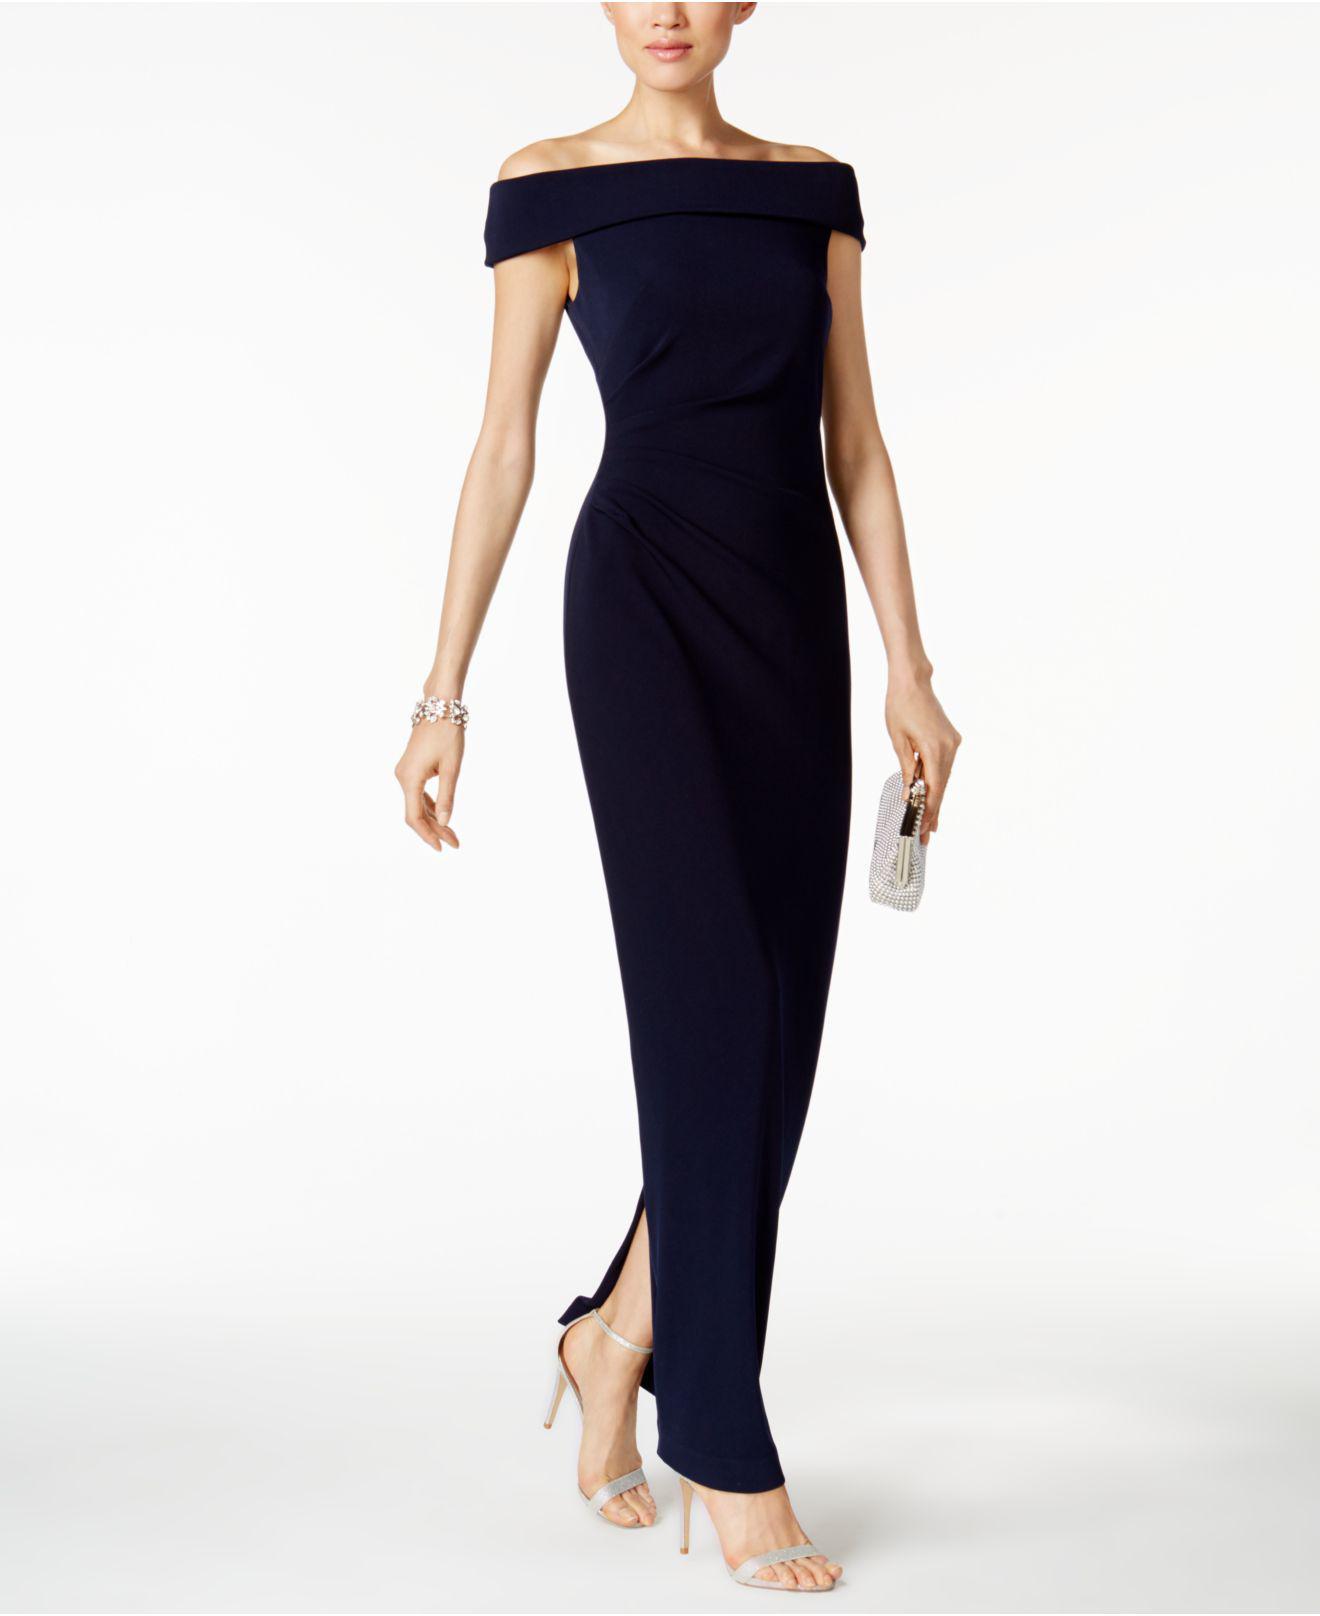 193007af136 Vince Camuto Jersey Off-the-shoulder Gown in Blue - Lyst